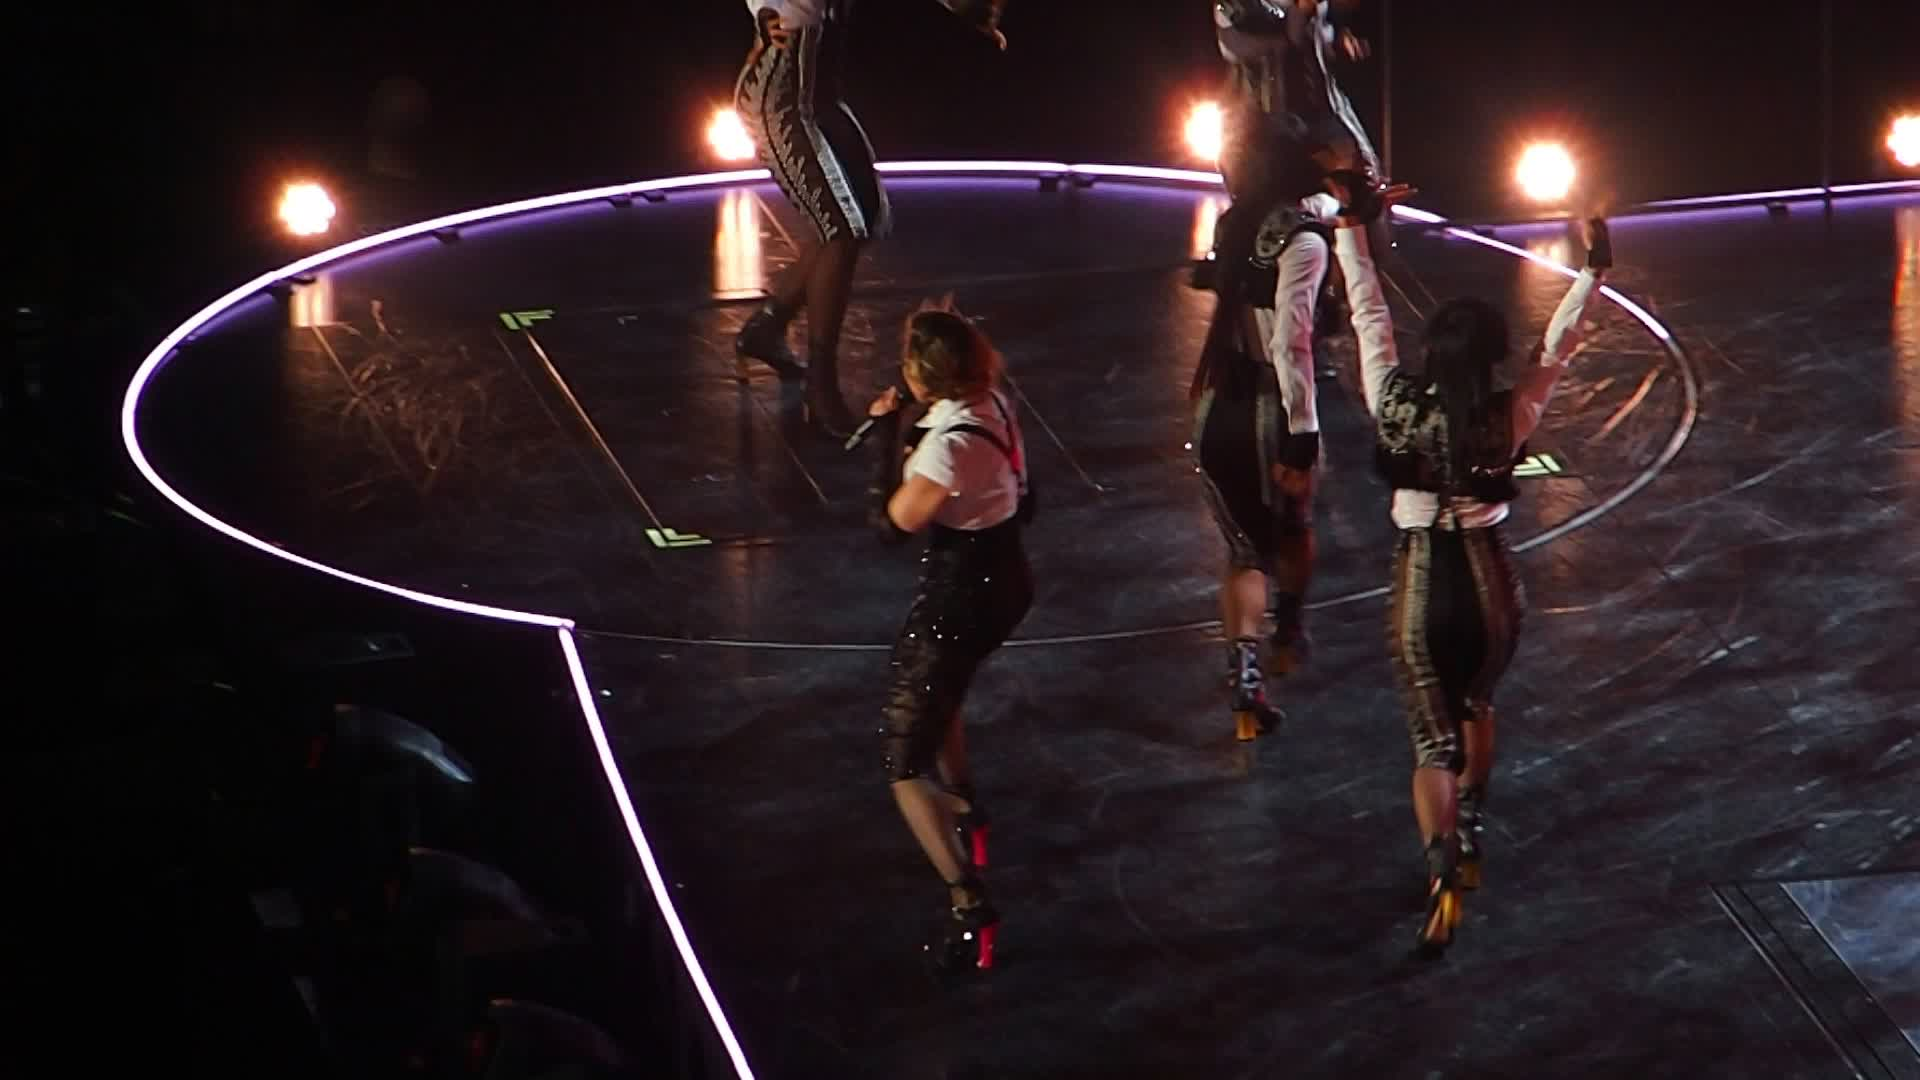 File:Madonna, Rebel Heart Tour, La Isla Bonita, Bell Center